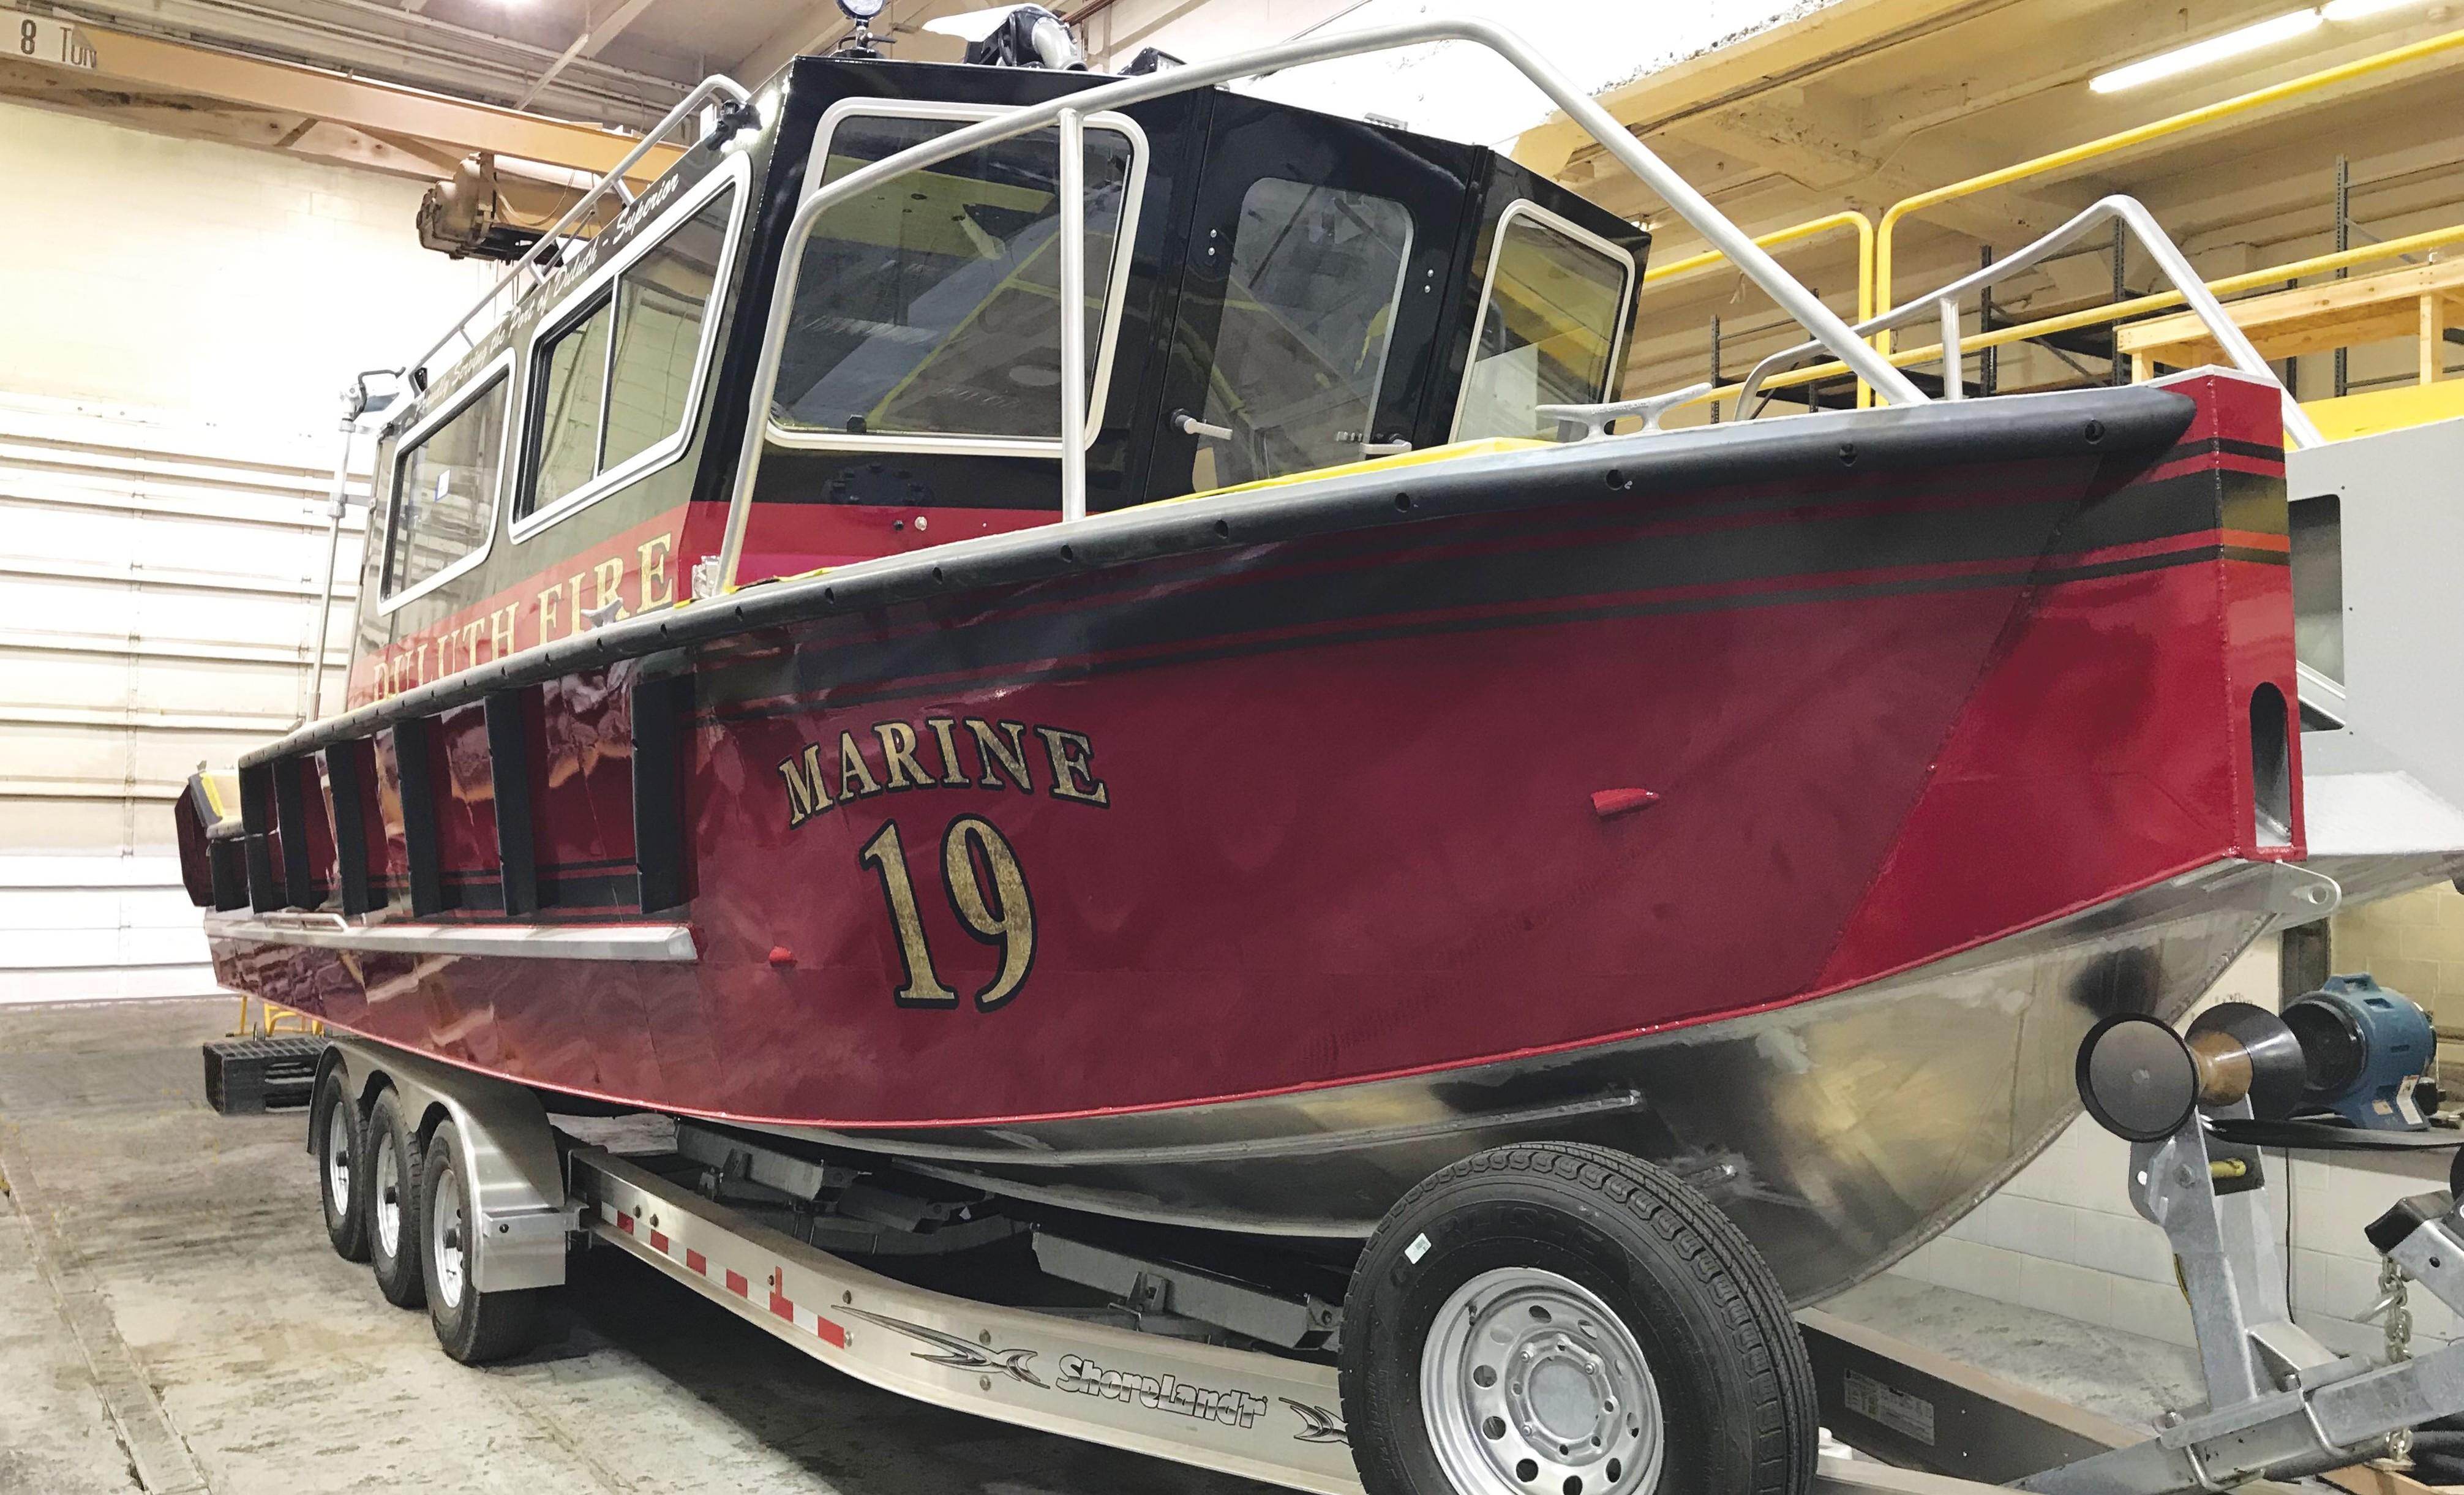 Lake Assault Fire Marine 19